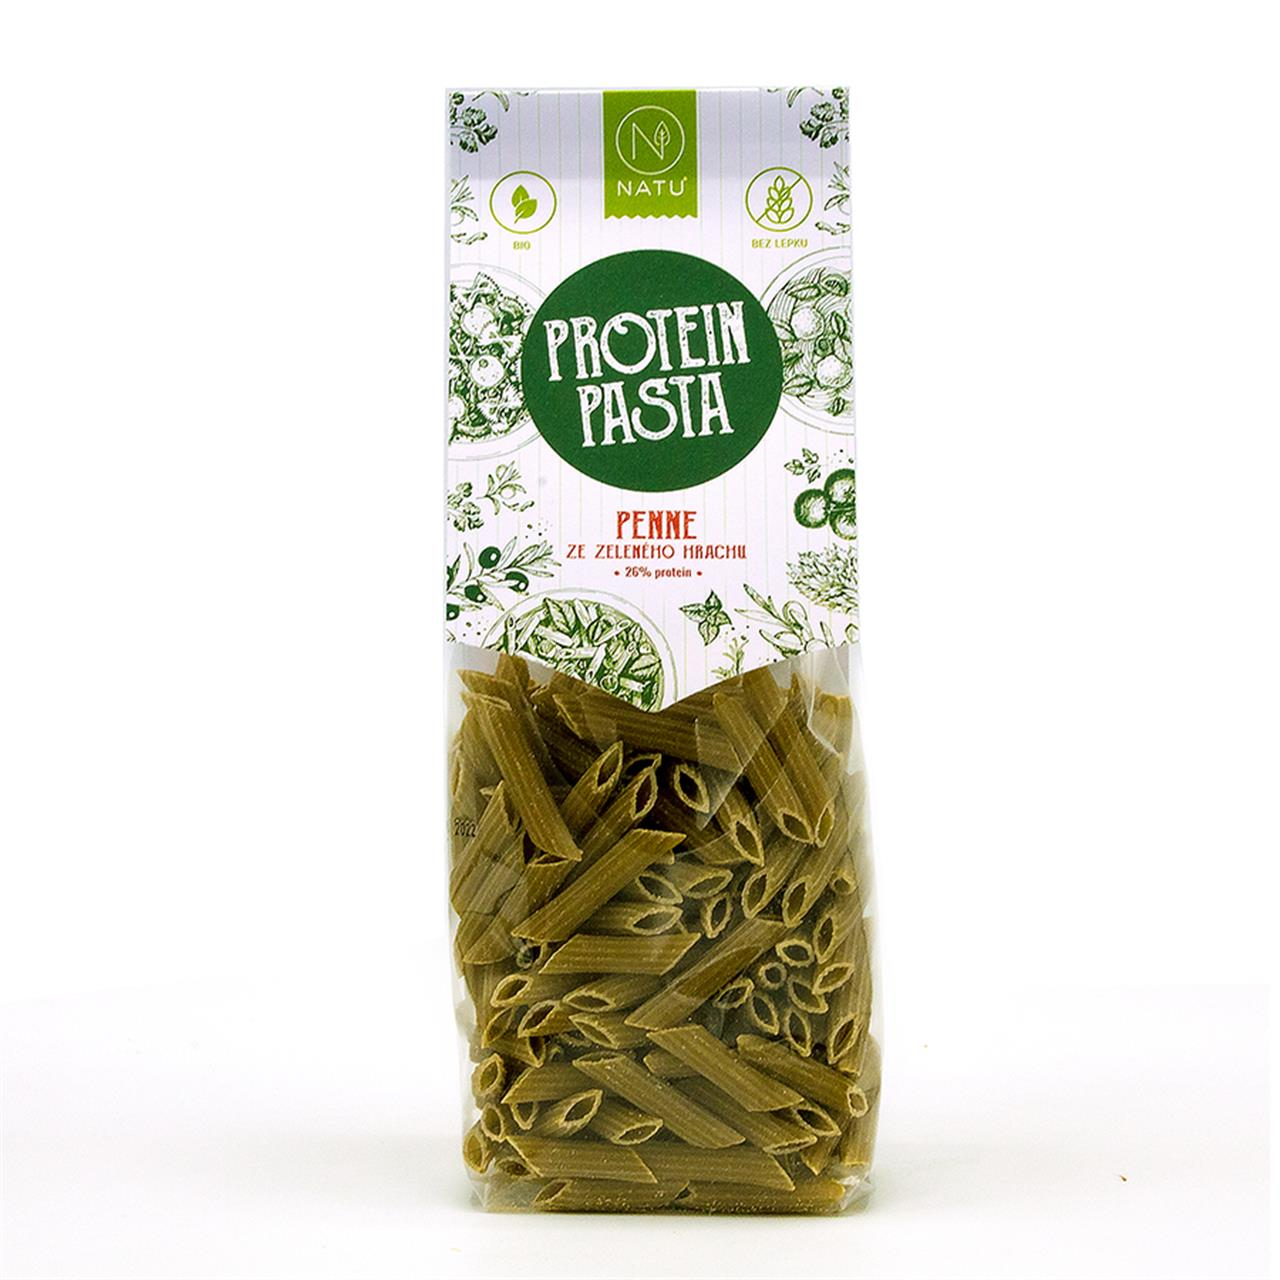 NATU - Protein pasta Penne ze zeleného hrachu BIO, 250g